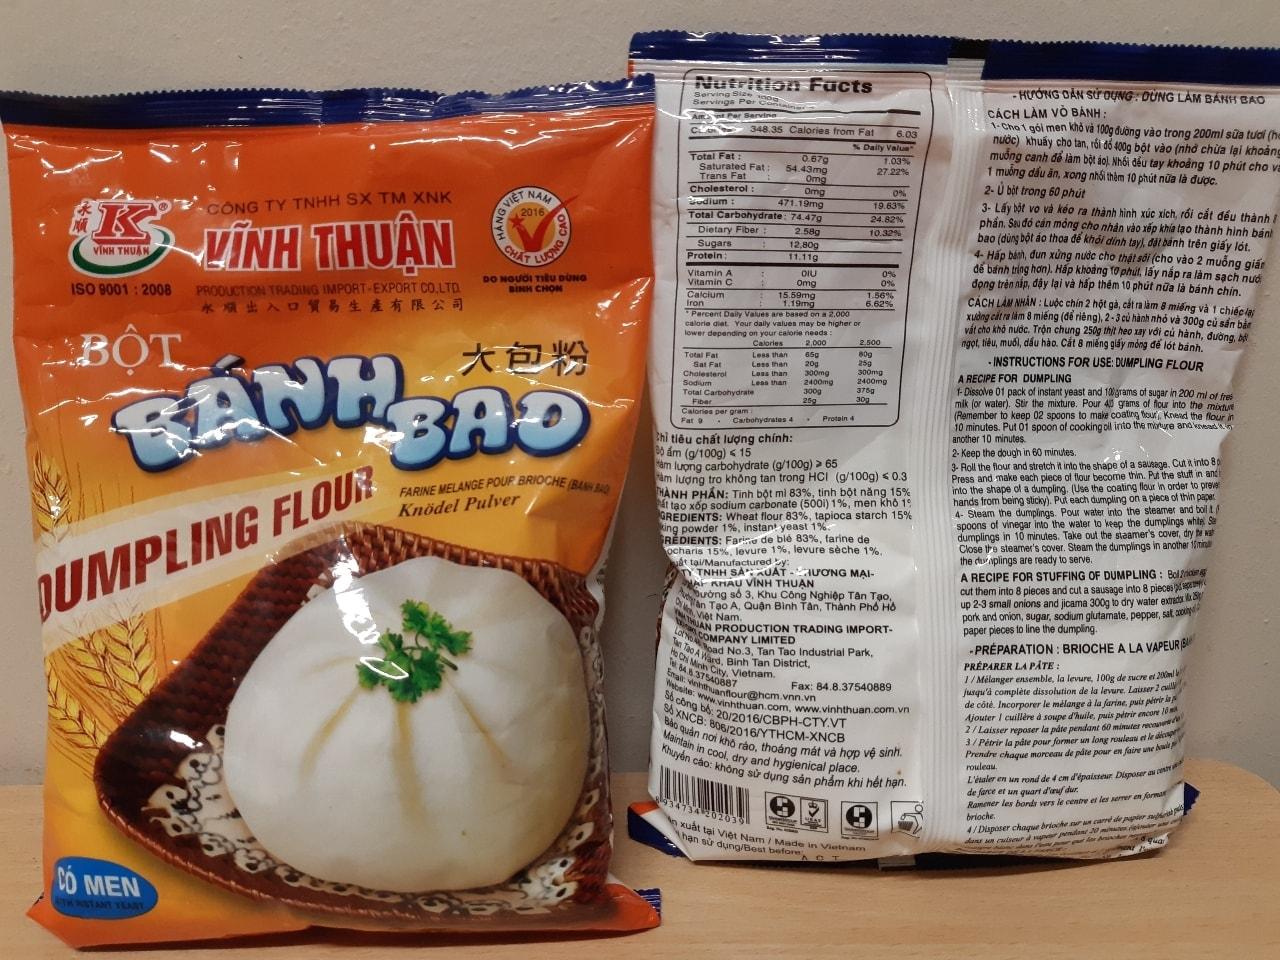 Vietnamese Dumpling Flour (1 bag left)